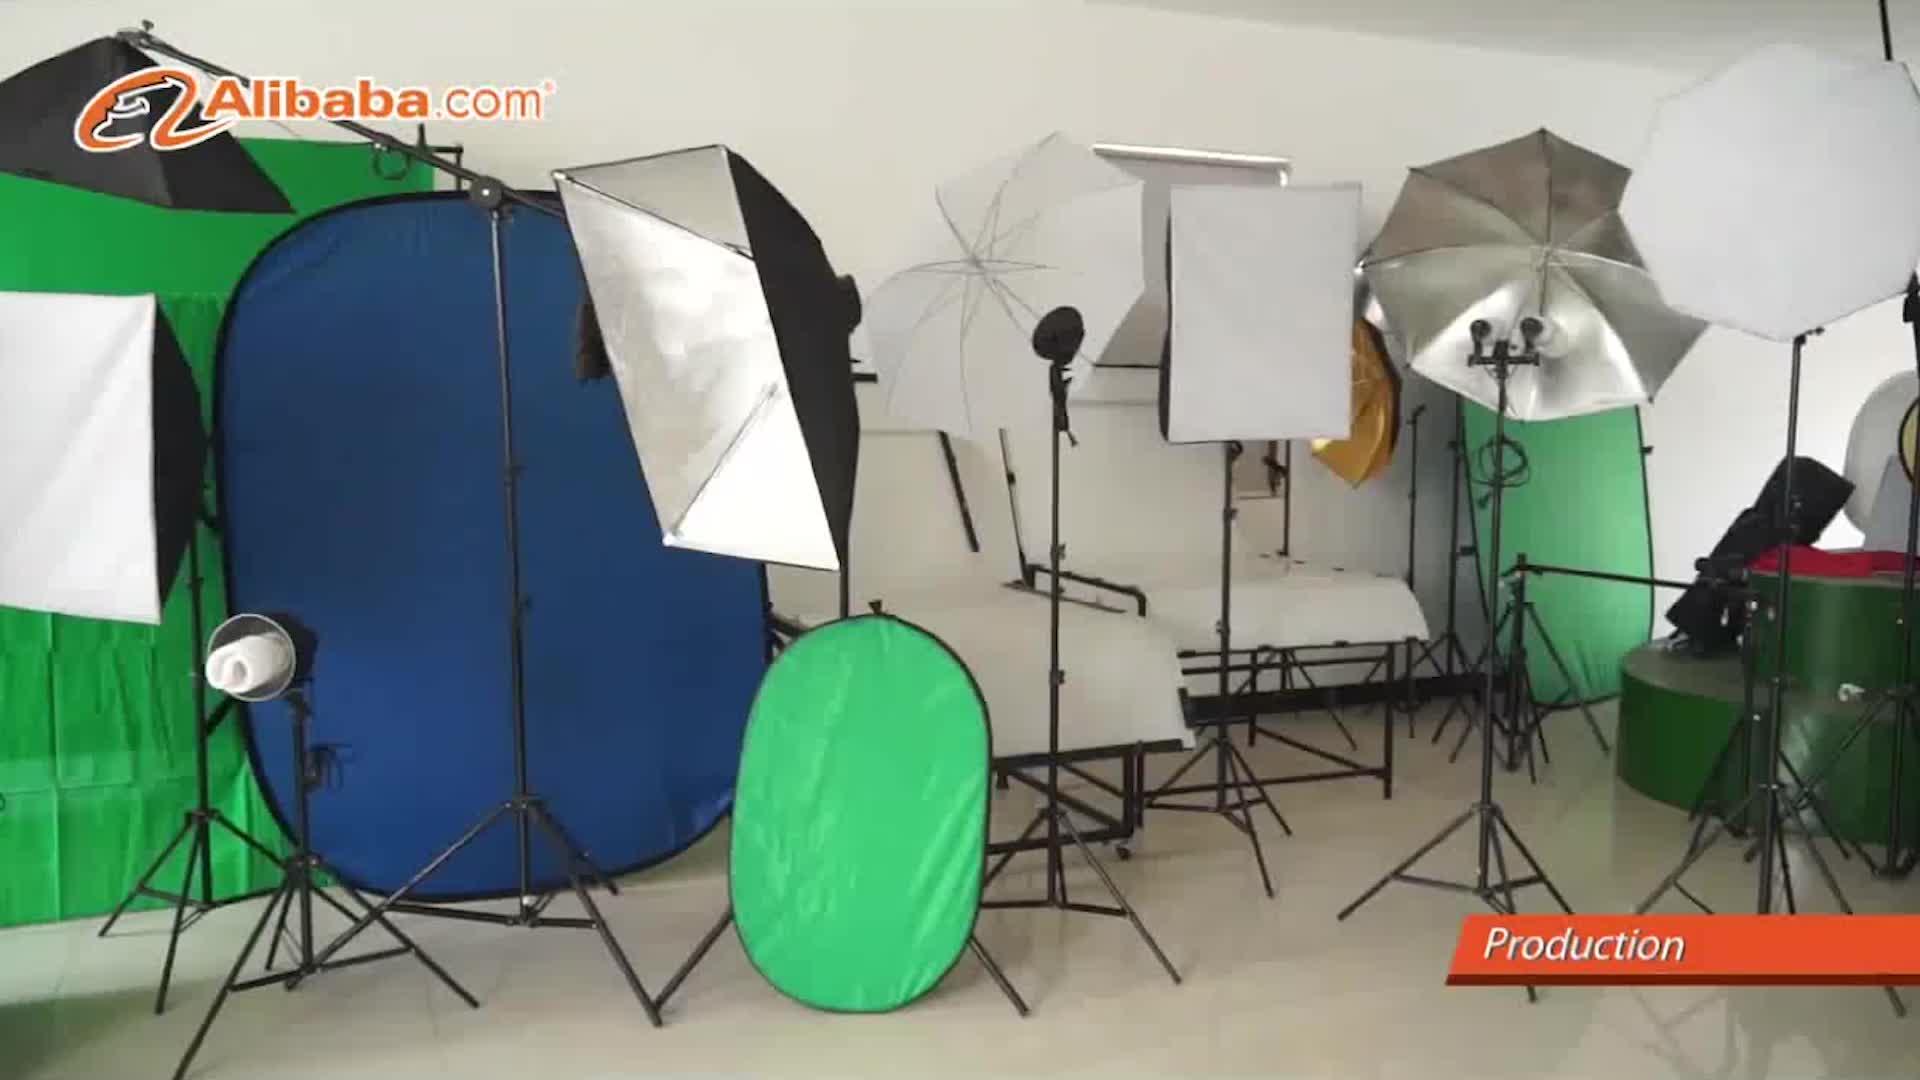 Photography aluminum tripod 2.1M light stand